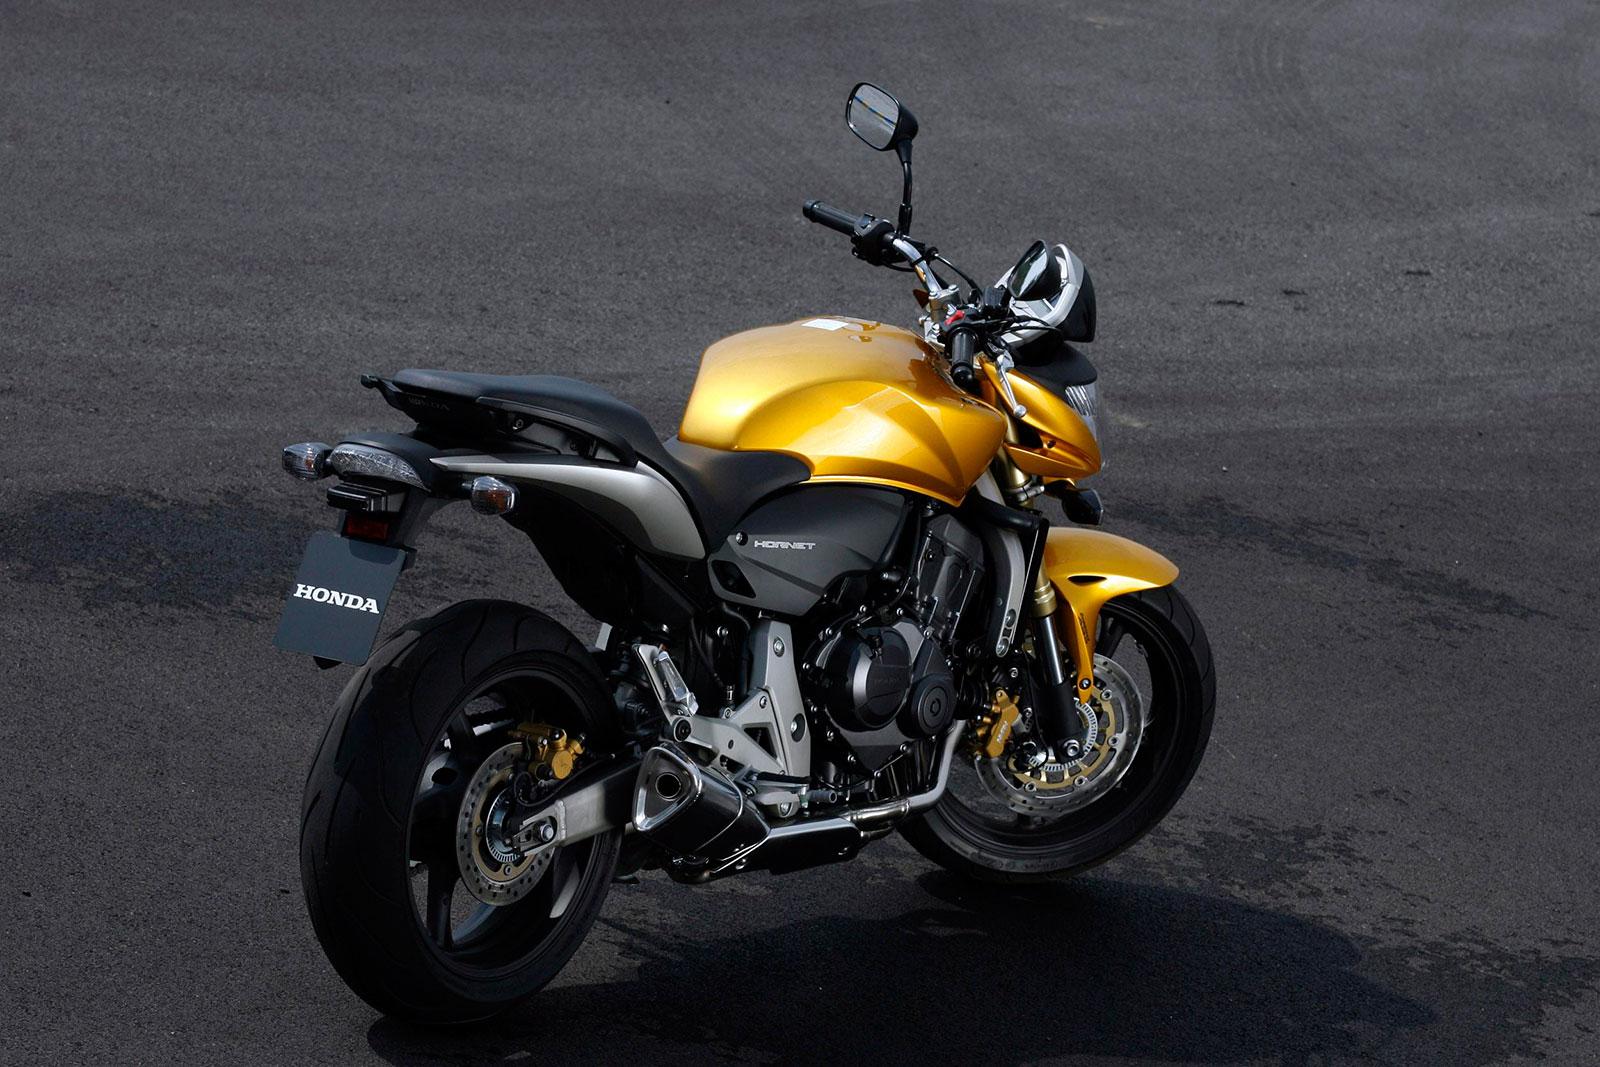 Honda CB 600 Hornet - motorcyclespecs.co.za